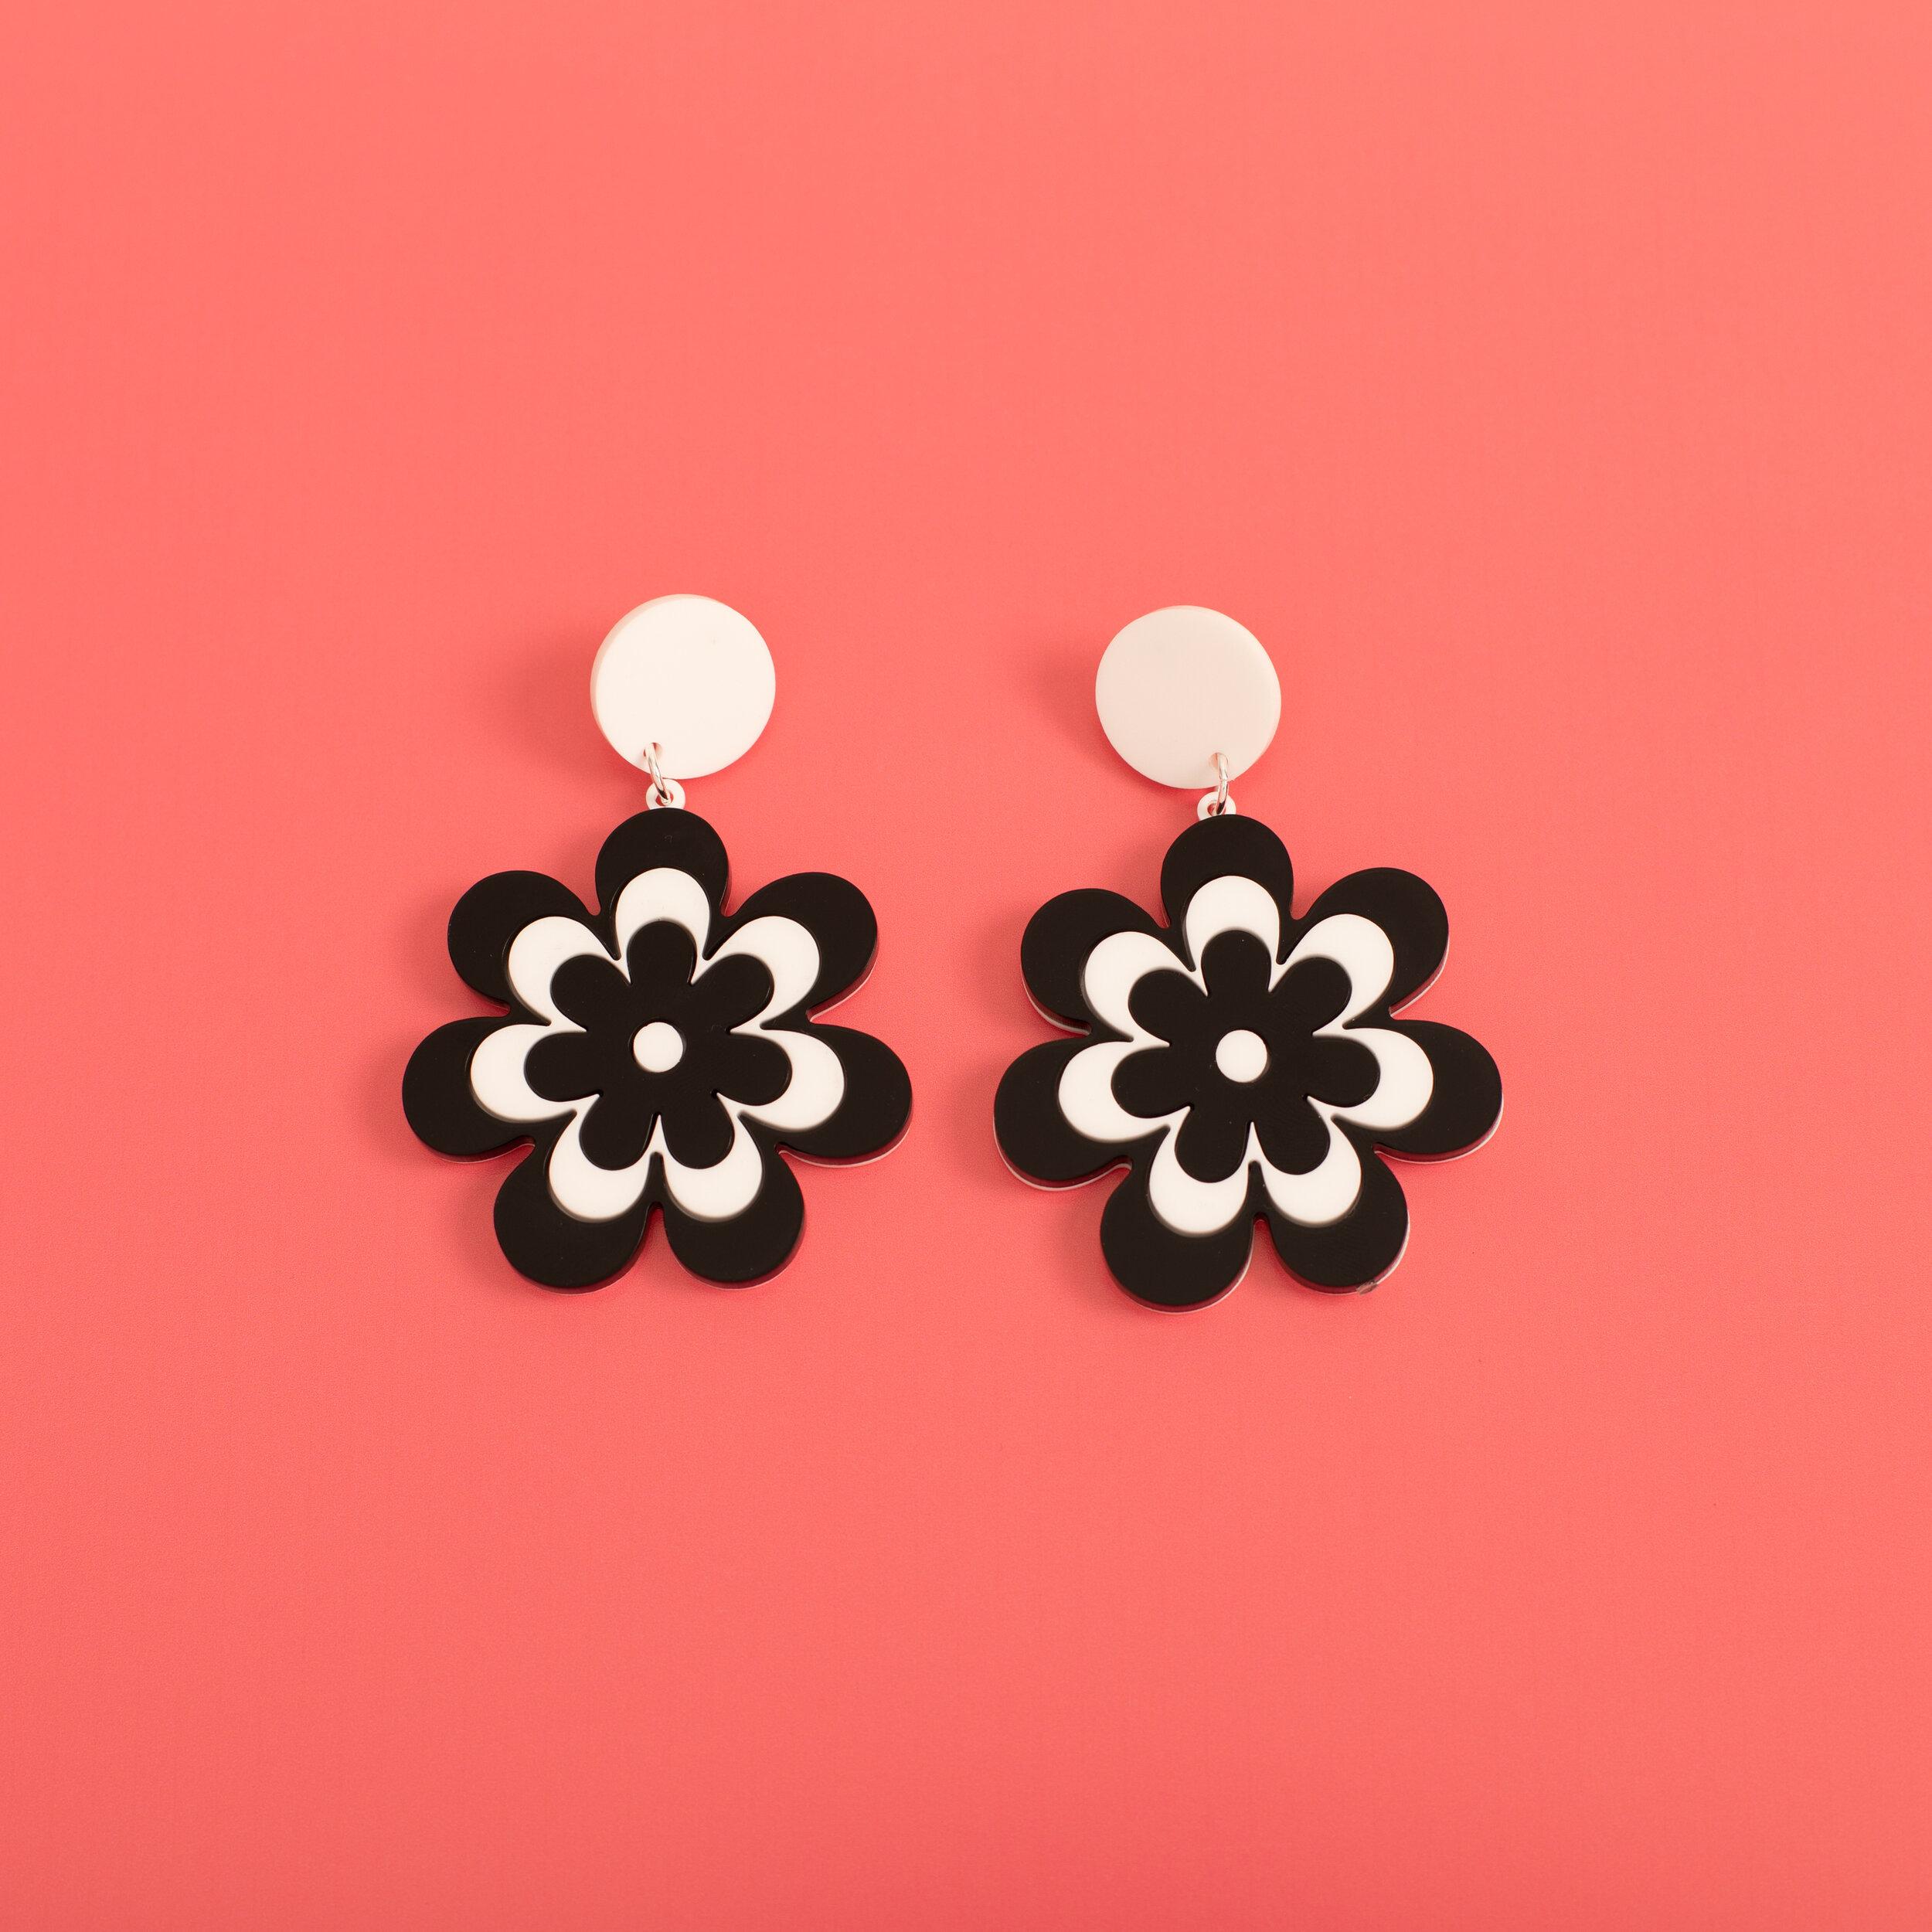 MindFlowers_Candy_Daisy_Black_White_Stud_Earrings.jpg